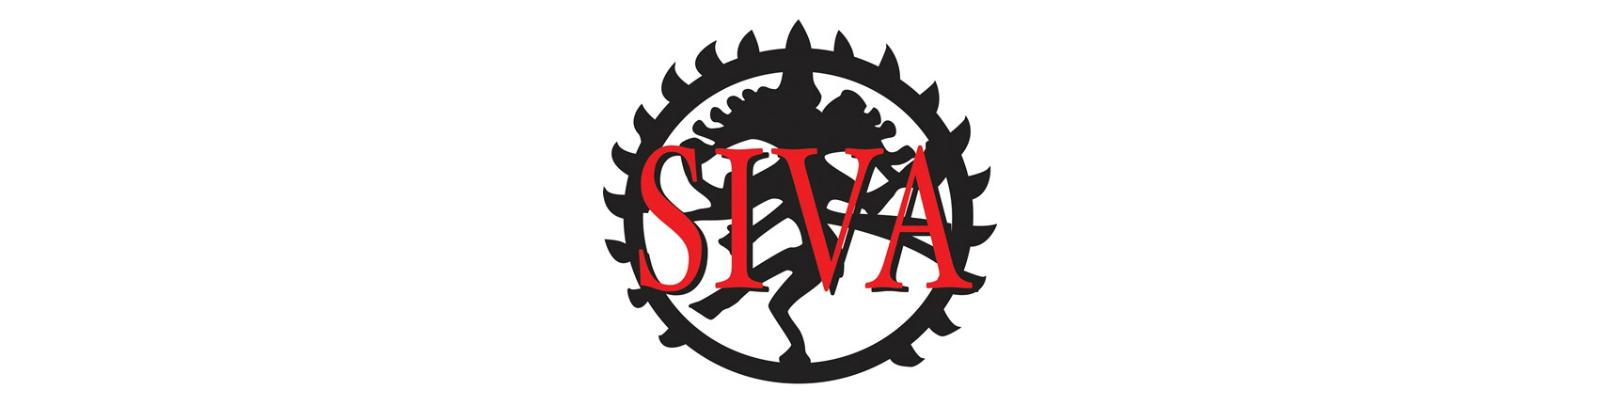 siva-logo-1600x400.jpg